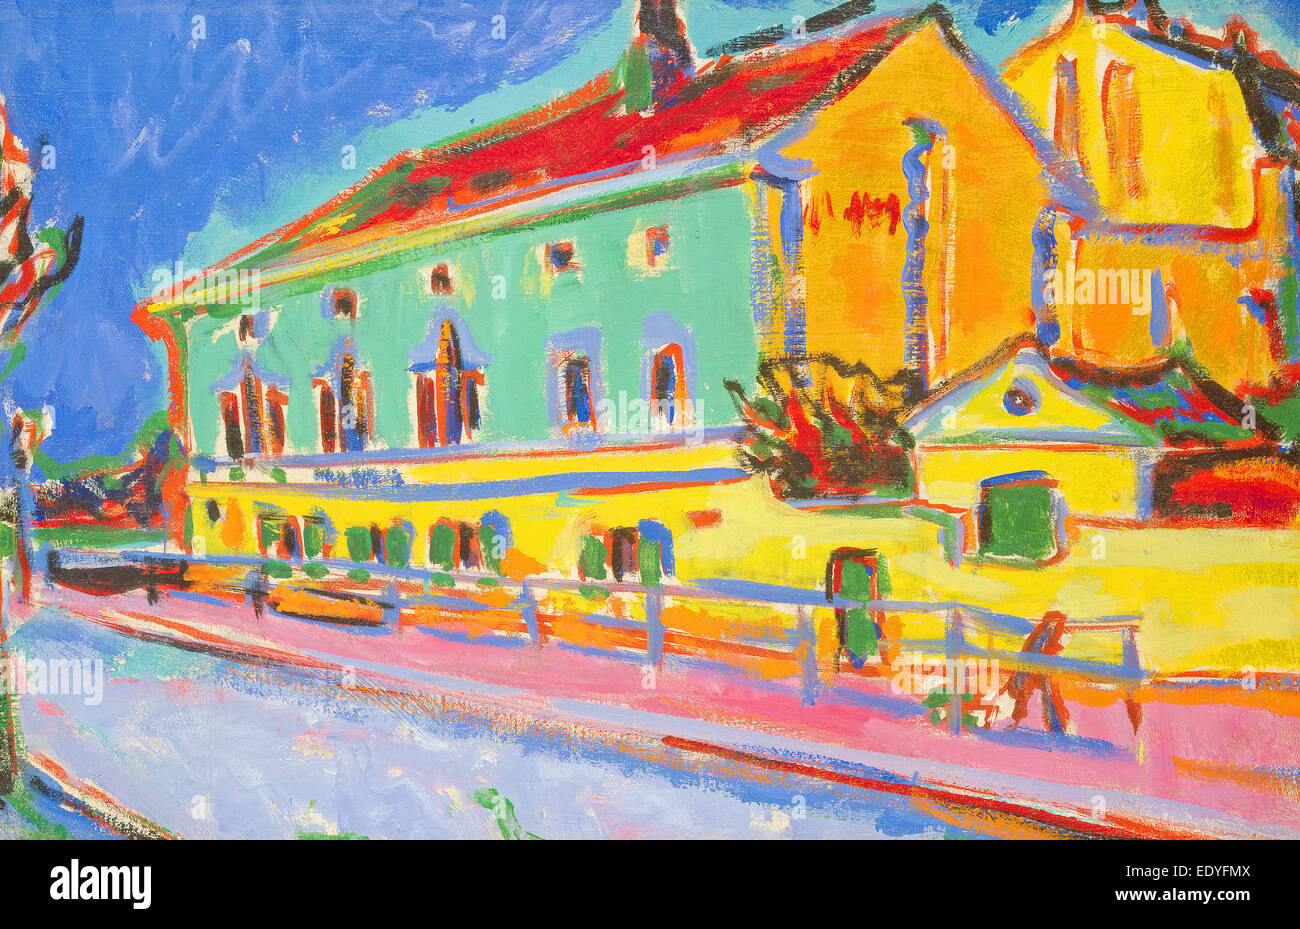 Ernst Ludwig Kirchner, Houses in Dresden, German, 1880 - 1938, 1909-1910, oil on canvas - Stock Image